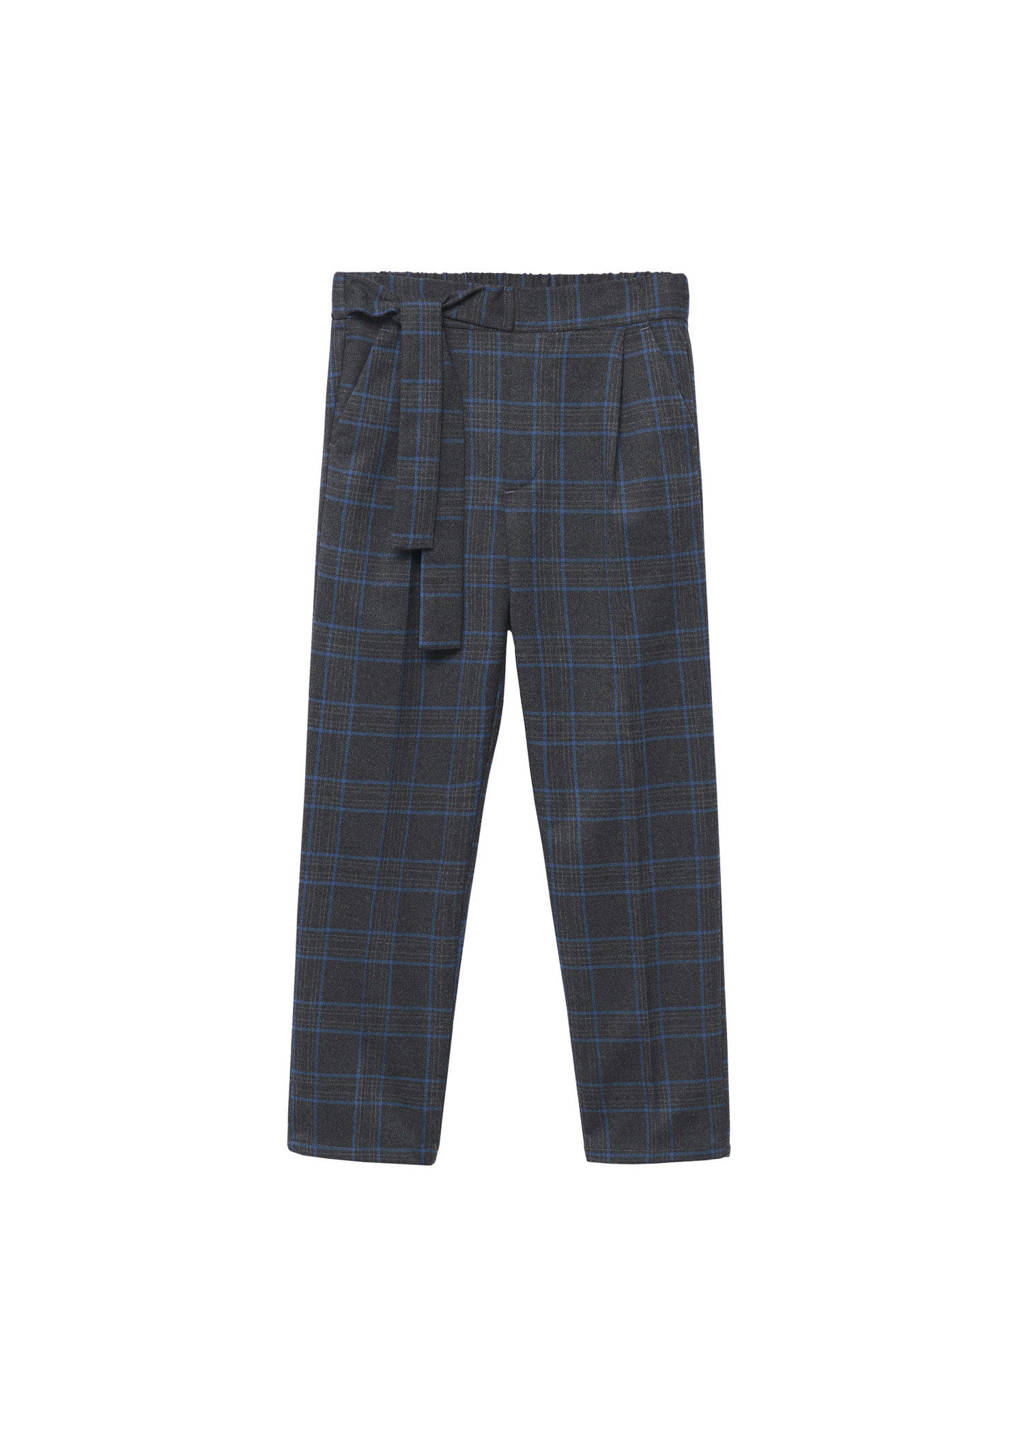 Mango Kids geruite high waist regular fit broek grijs/blauw, Grijs/blauw